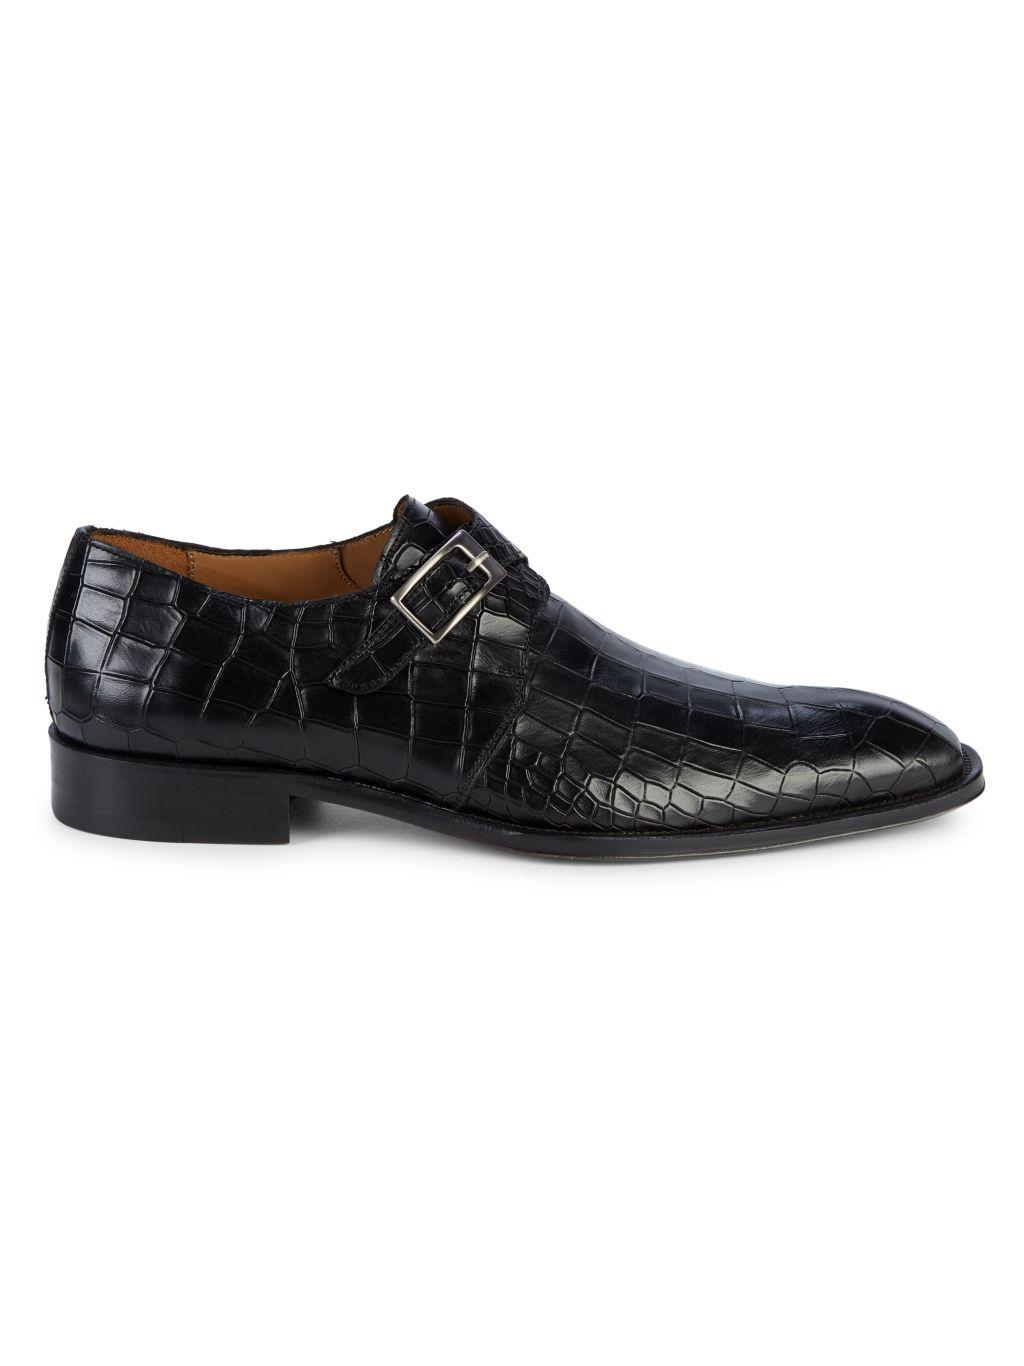 Mezlan Croc-Embossed Leather Monk-Strap Shoes